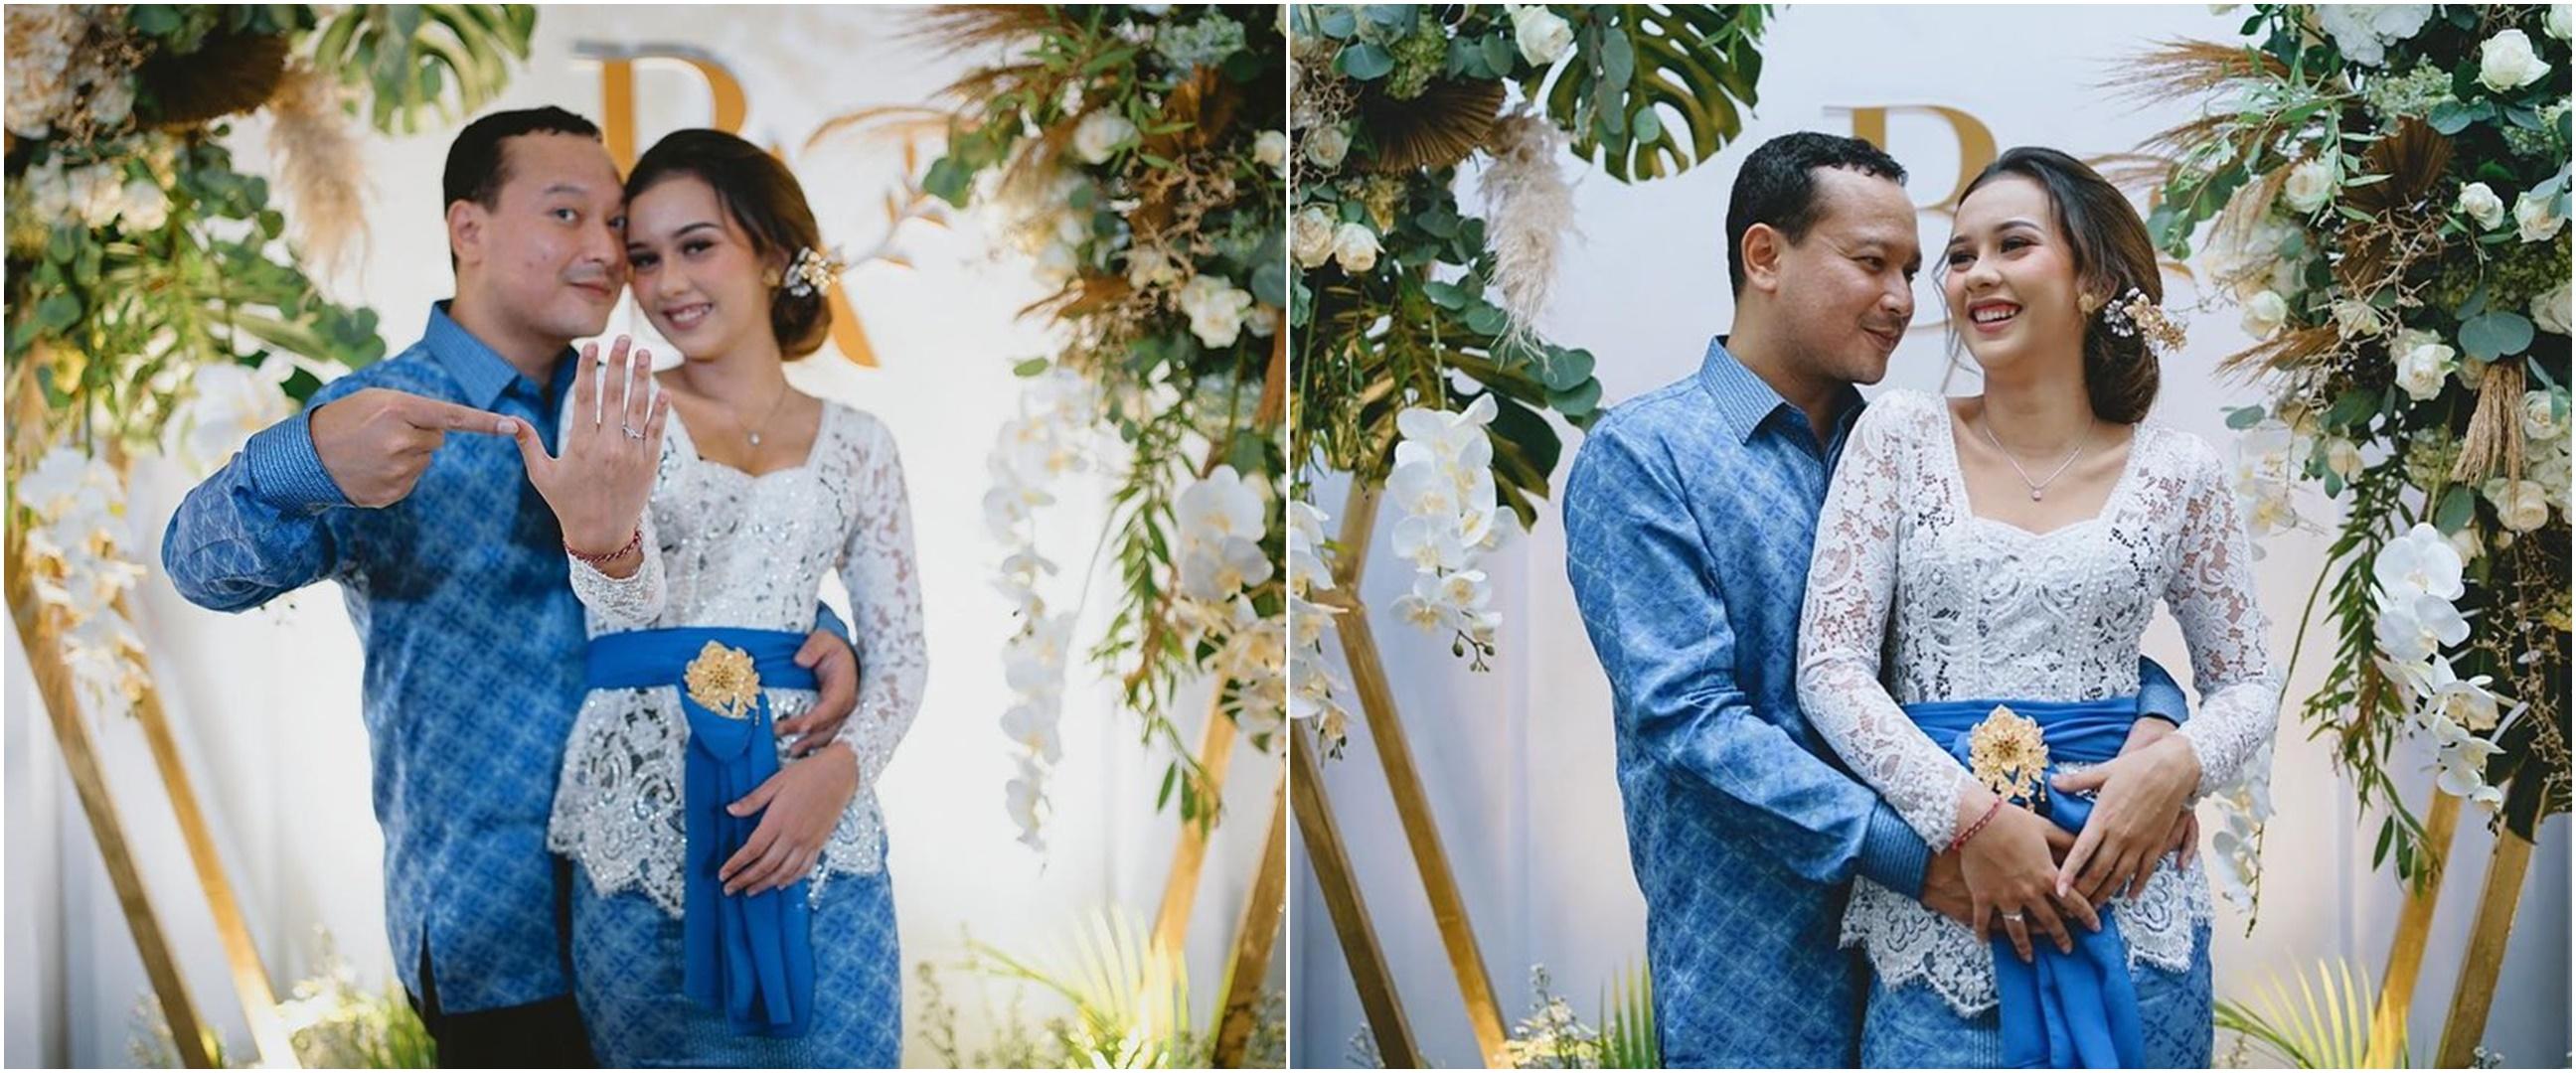 10 Potret pertunangan Banyu Biru dengan Anastasia Adamova, romantis